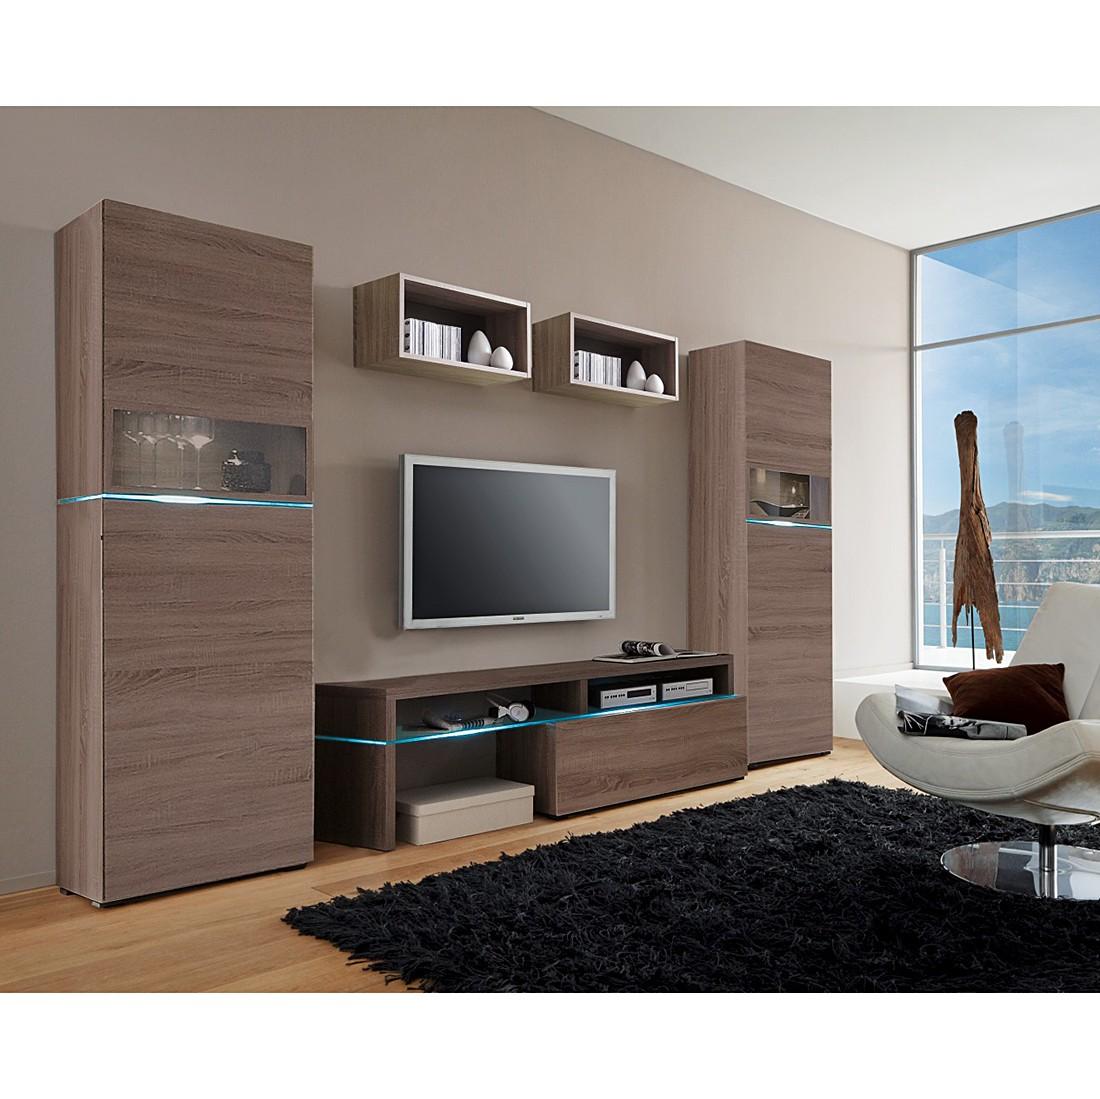 eek a wohnwand colourart iii 5 teilig mit beleuchtung sonoma eiche tr ffel dekor cs. Black Bedroom Furniture Sets. Home Design Ideas